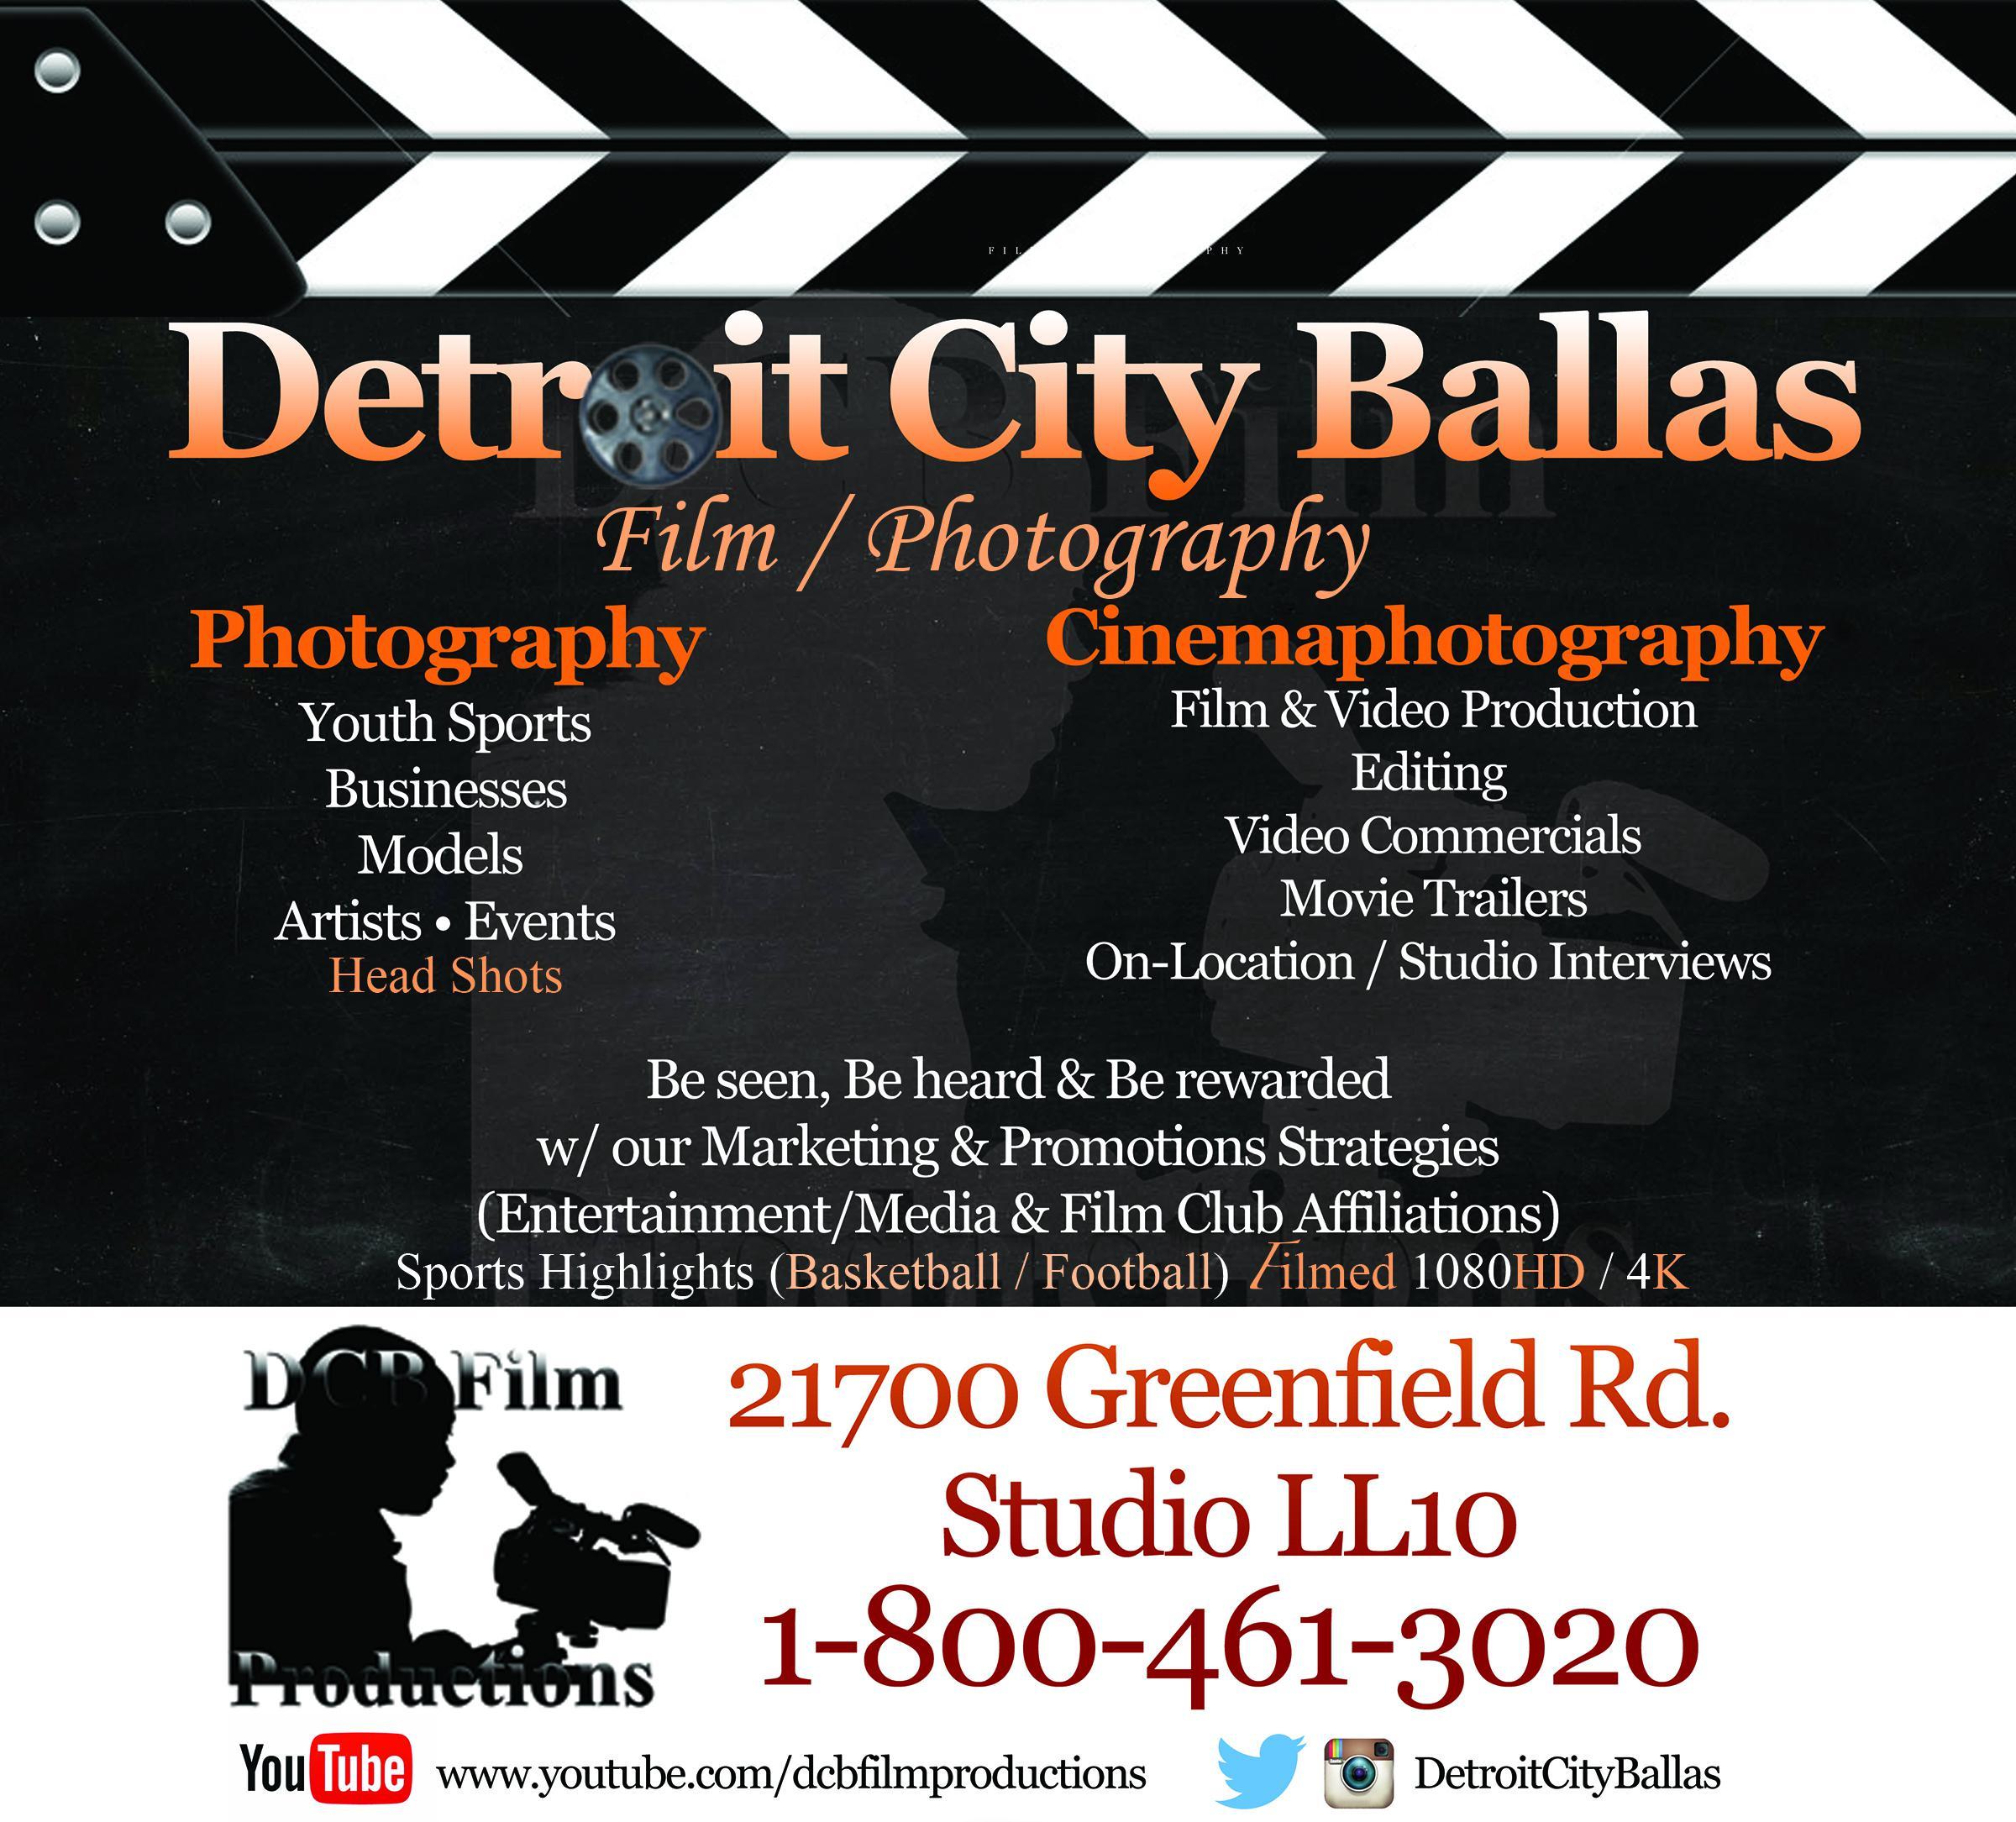 Detroit City Ballas Film/Photography Capture,Film & Edit all Sports Highlights